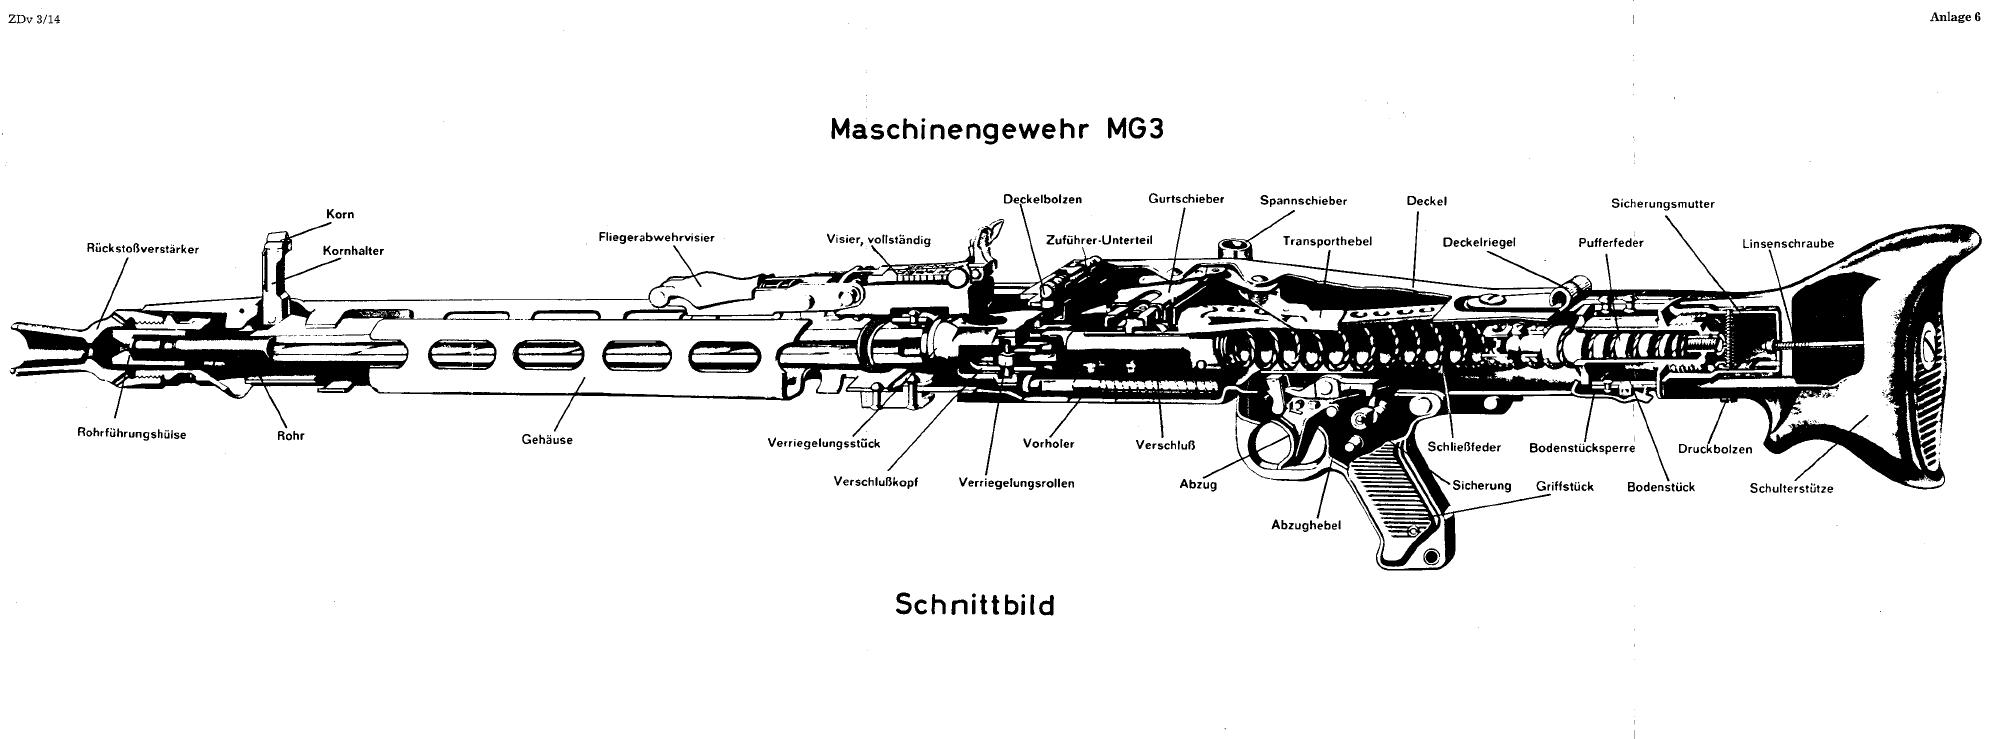 Schnittbild.MG3.jpg